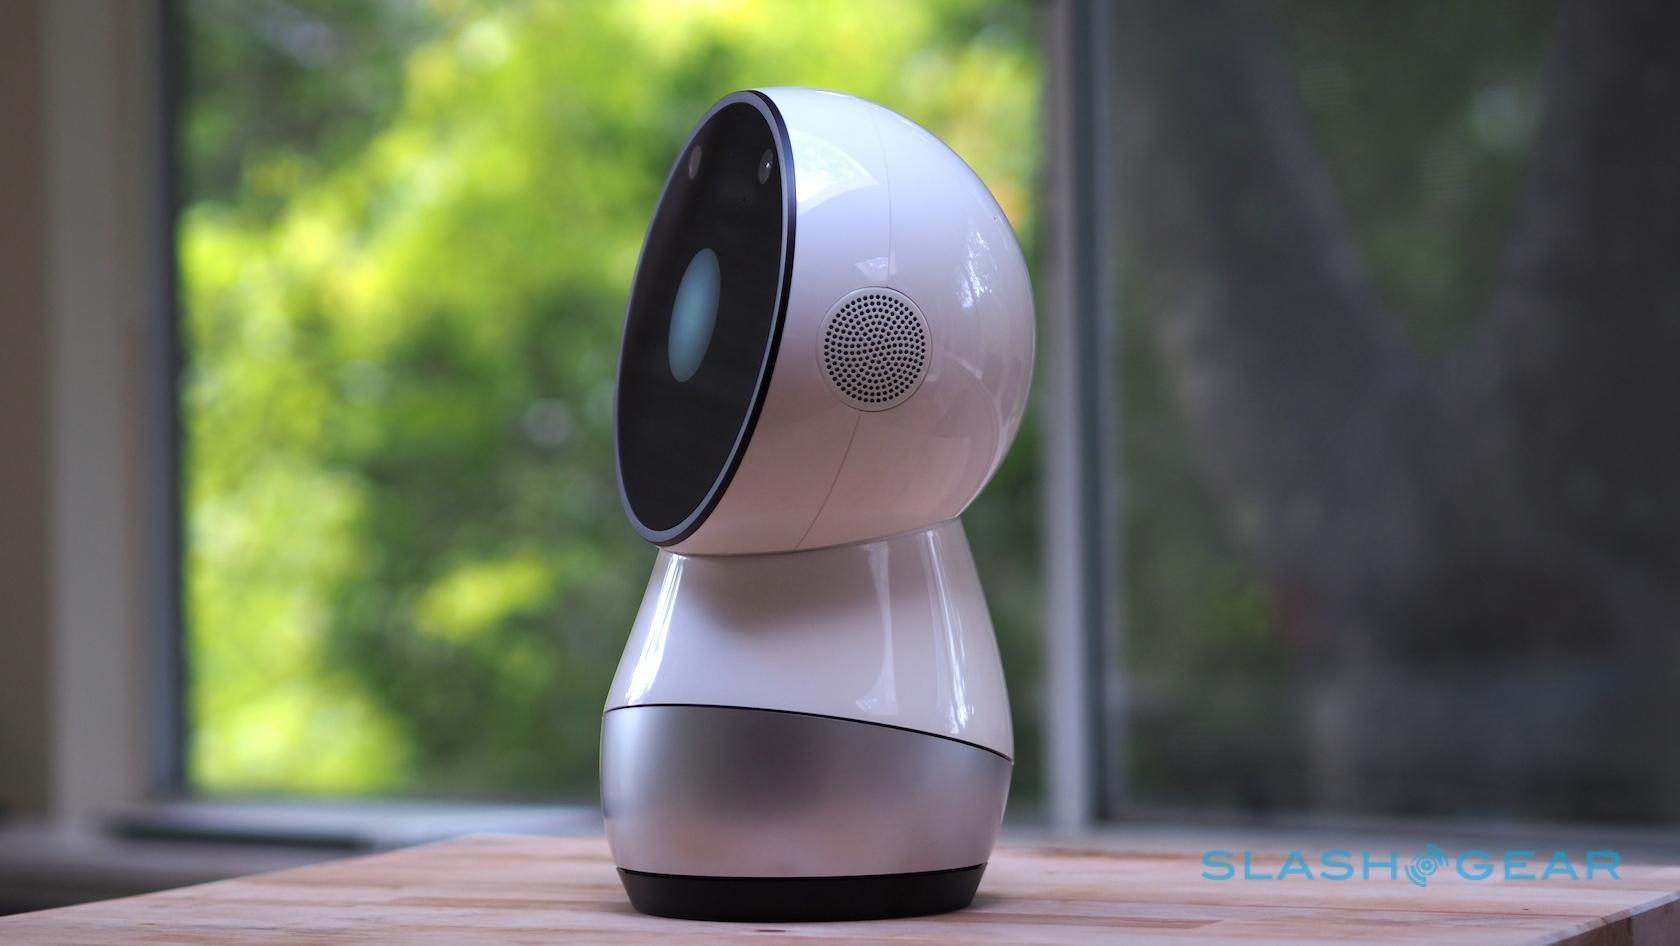 Jibo Review: Alexa gets some cute competition - SlashGear